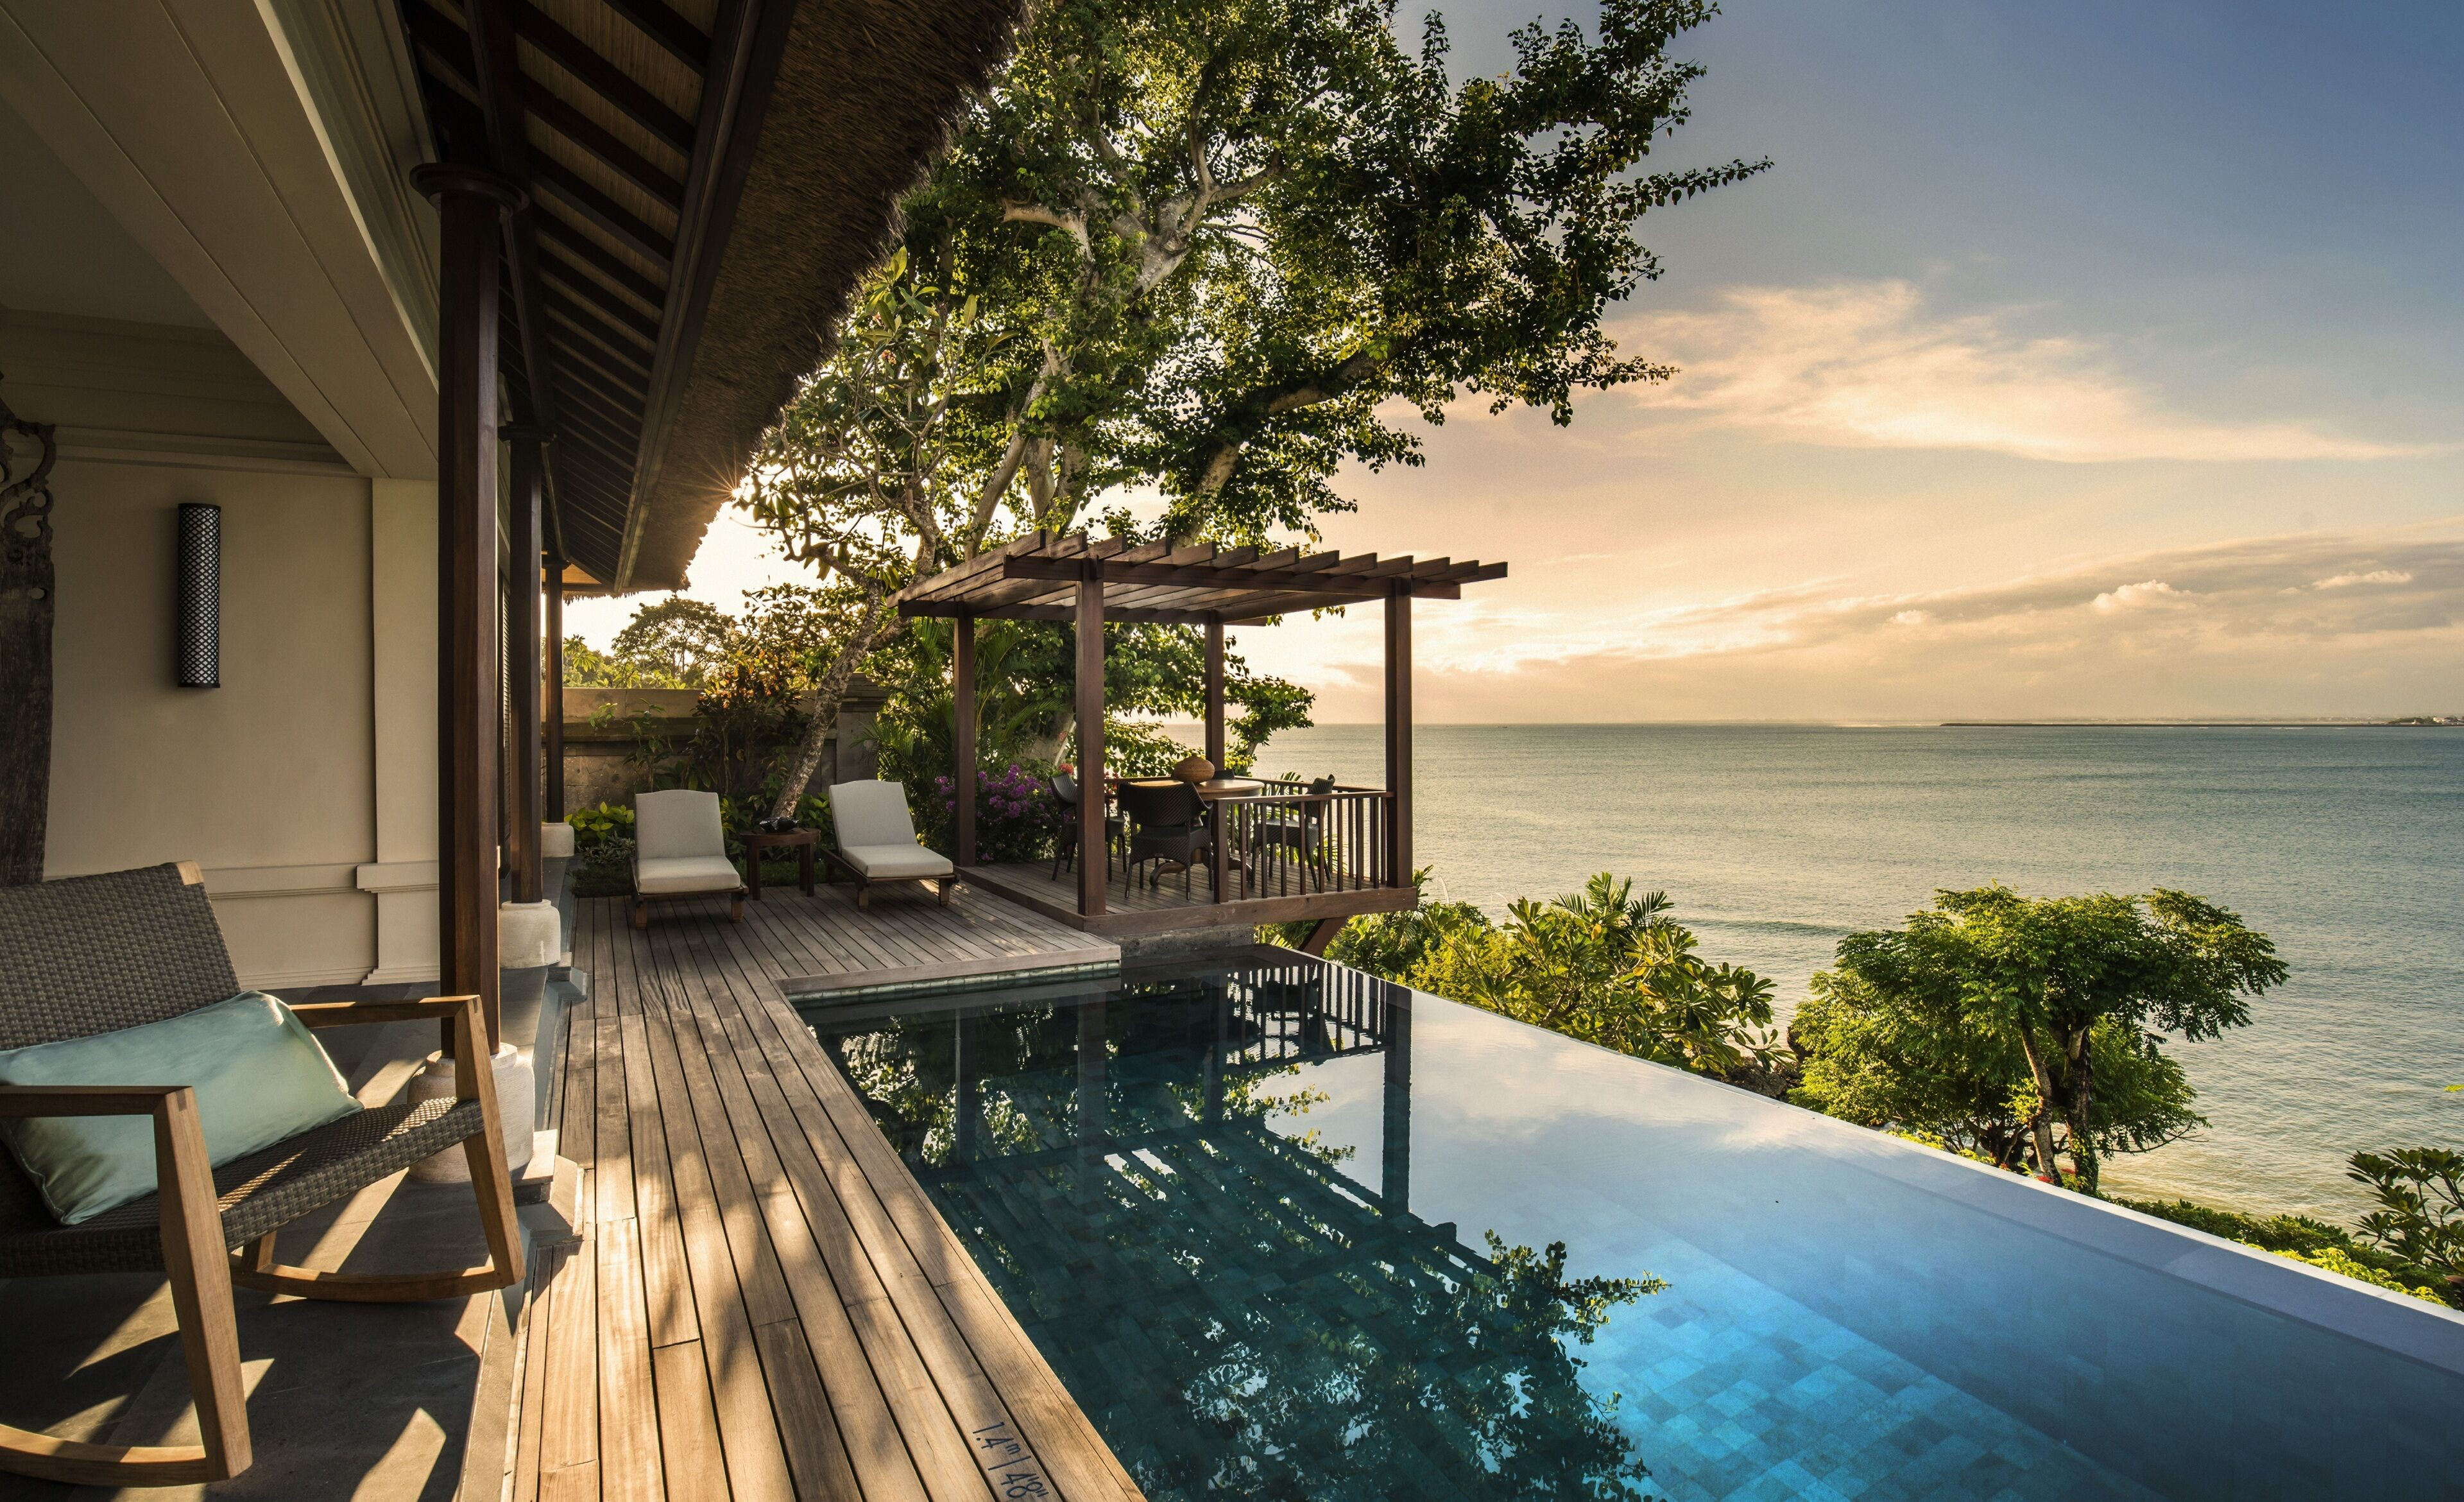 Courtesy of Four Seasons Resort Bali at Jimbaran Bay / Expedia.com